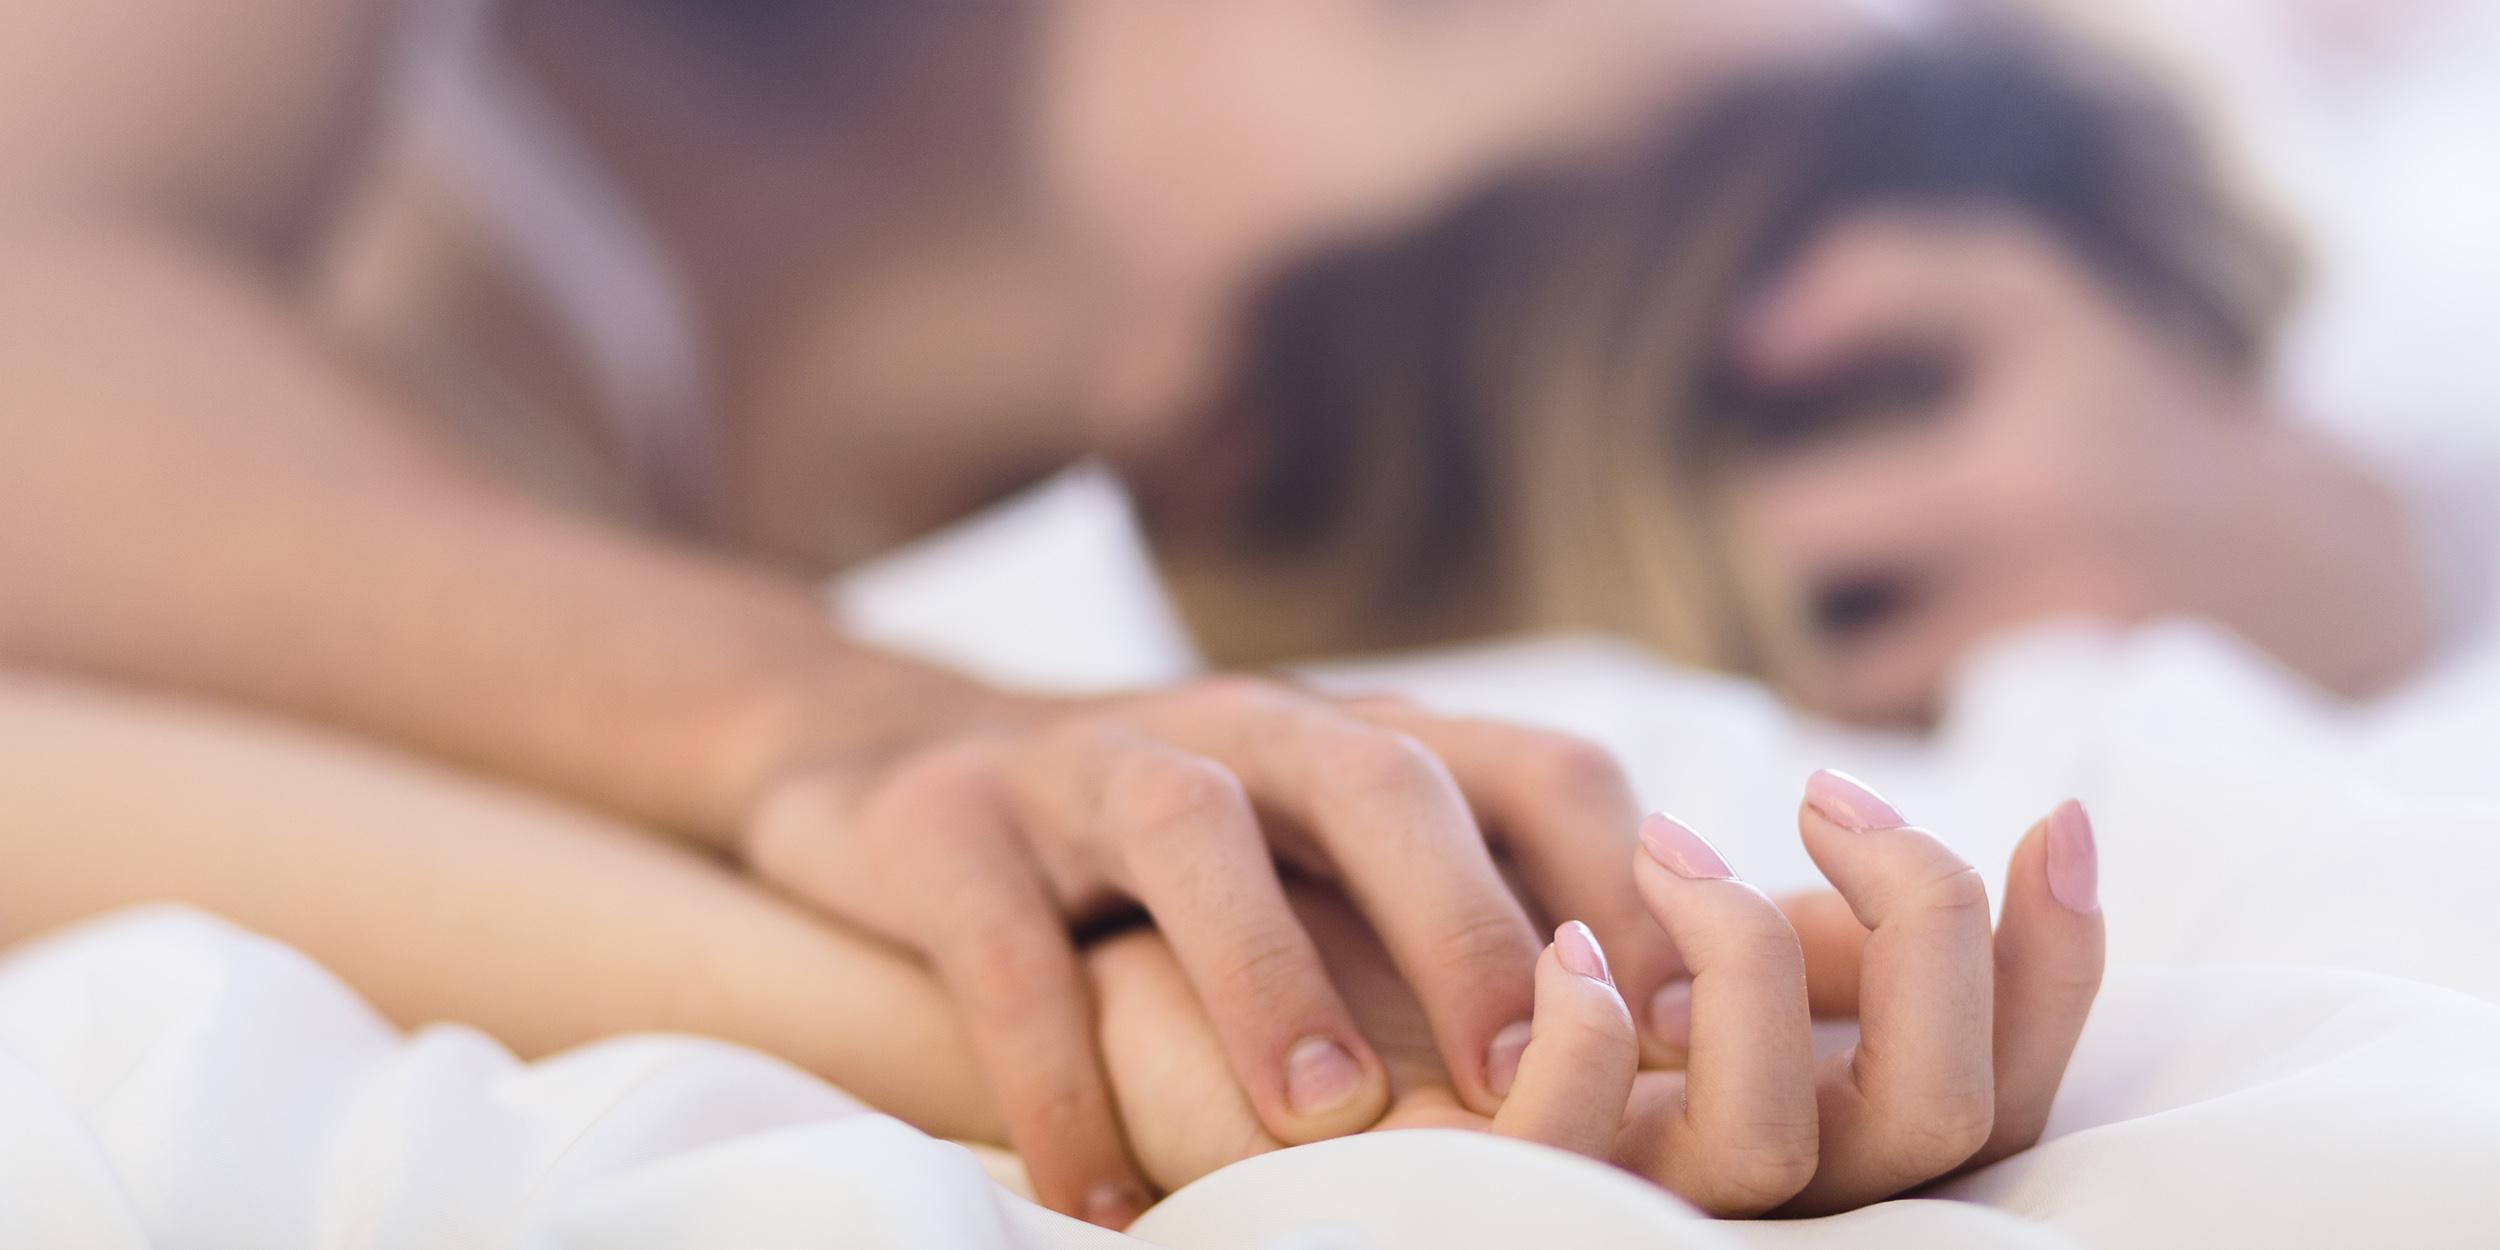 Что нпавится при сексе мужчине